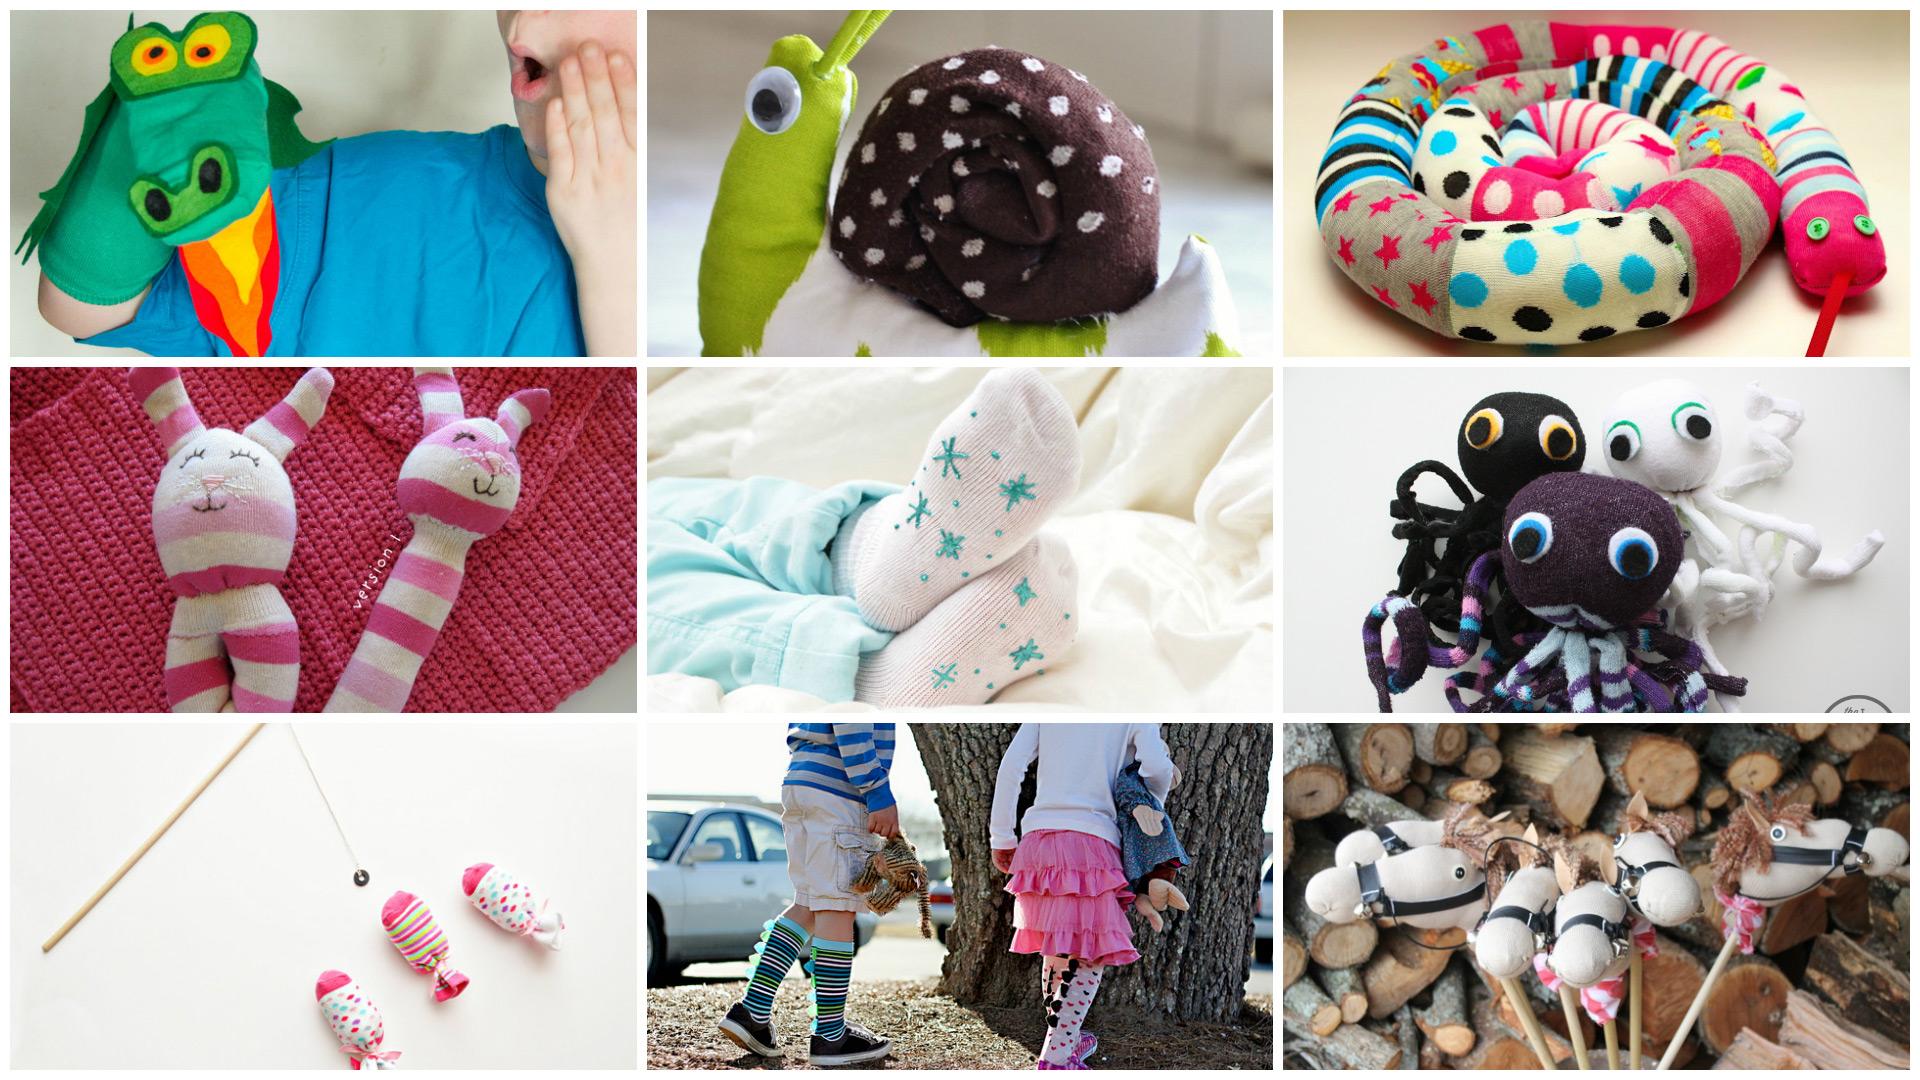 Sock crafts | Sheknows.com